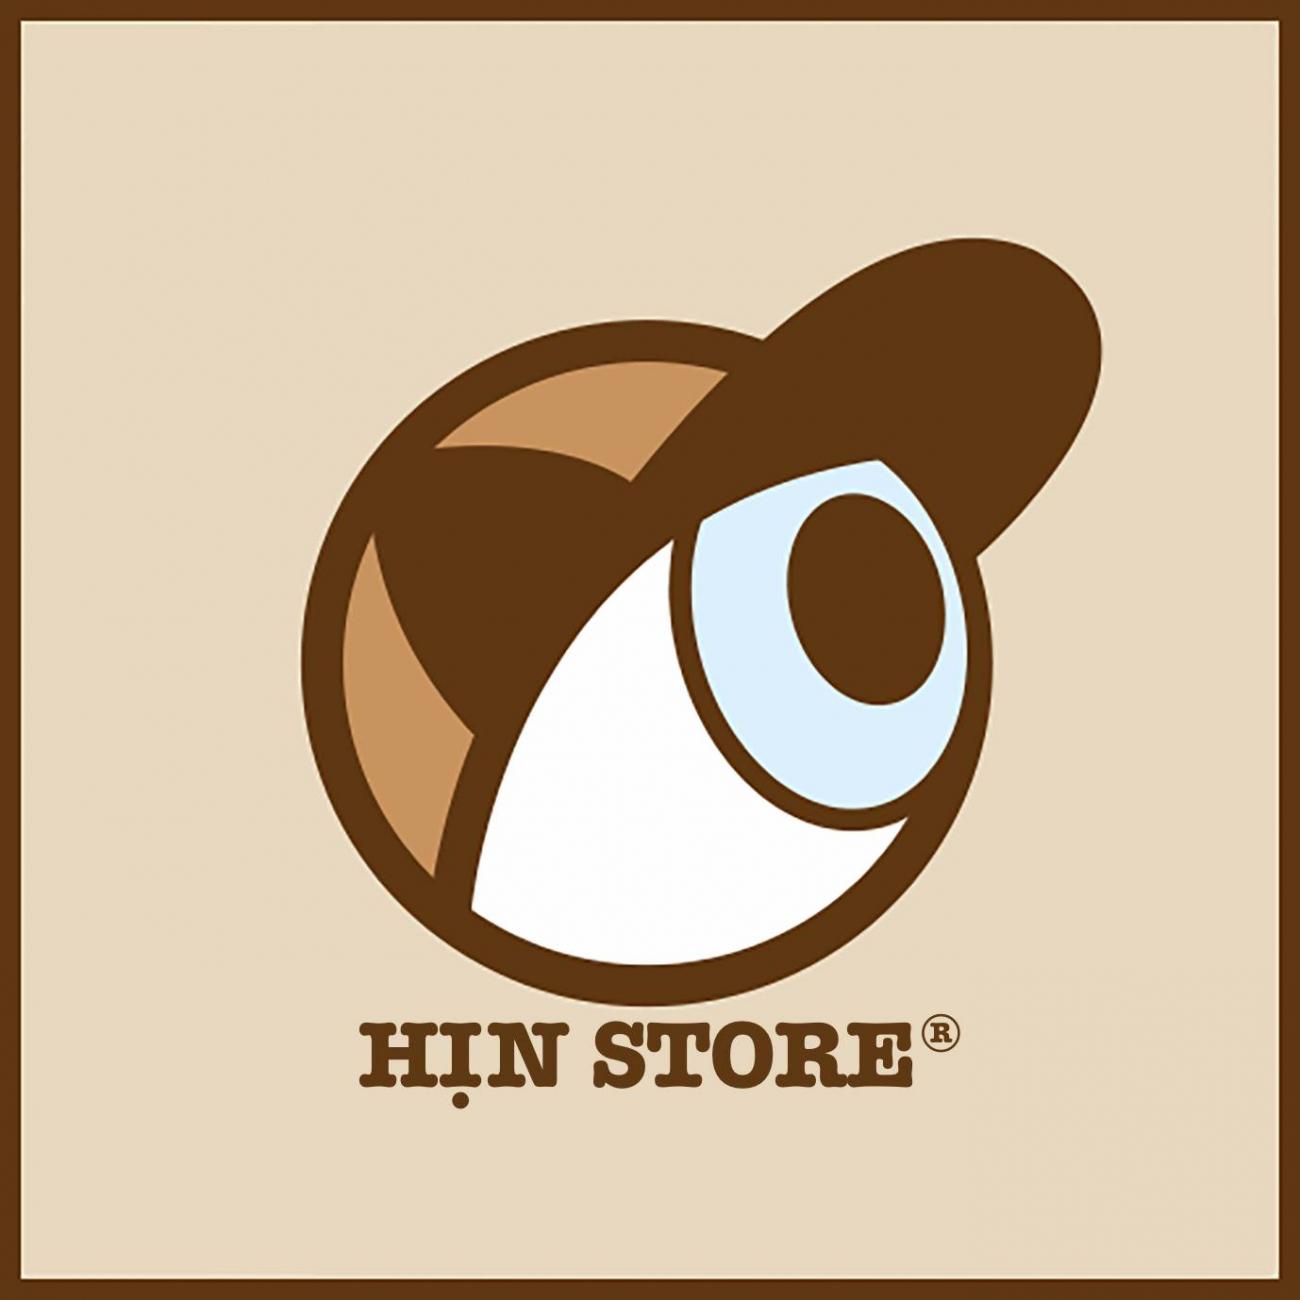 Nón nam Hịn Store